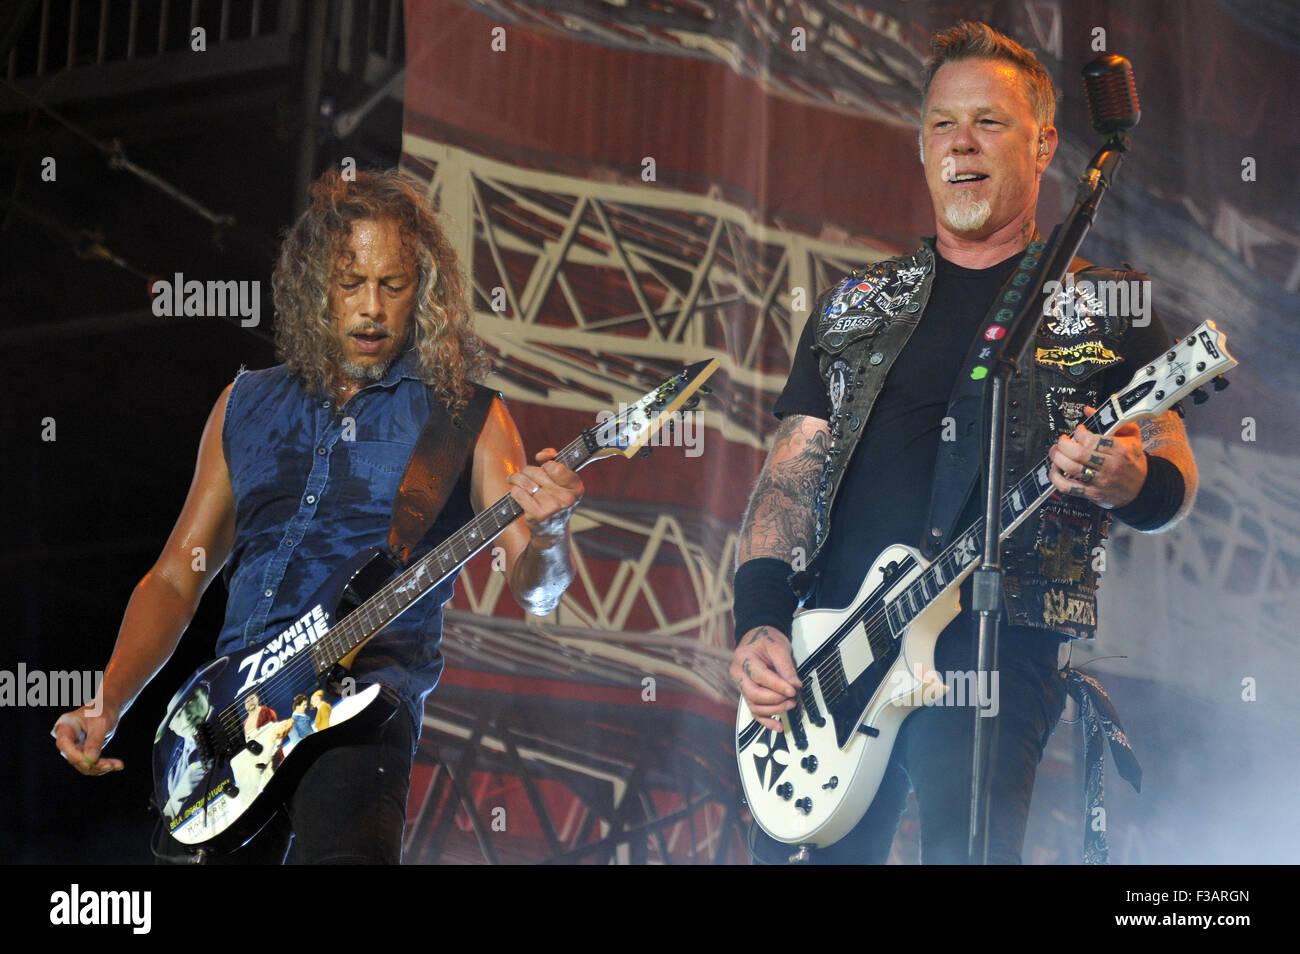 Lollapalooza Festival 2015 - Performances - Metallica  Featuring: James Hetfield, Kirk Hammett, Metallica Where: - Stock Image